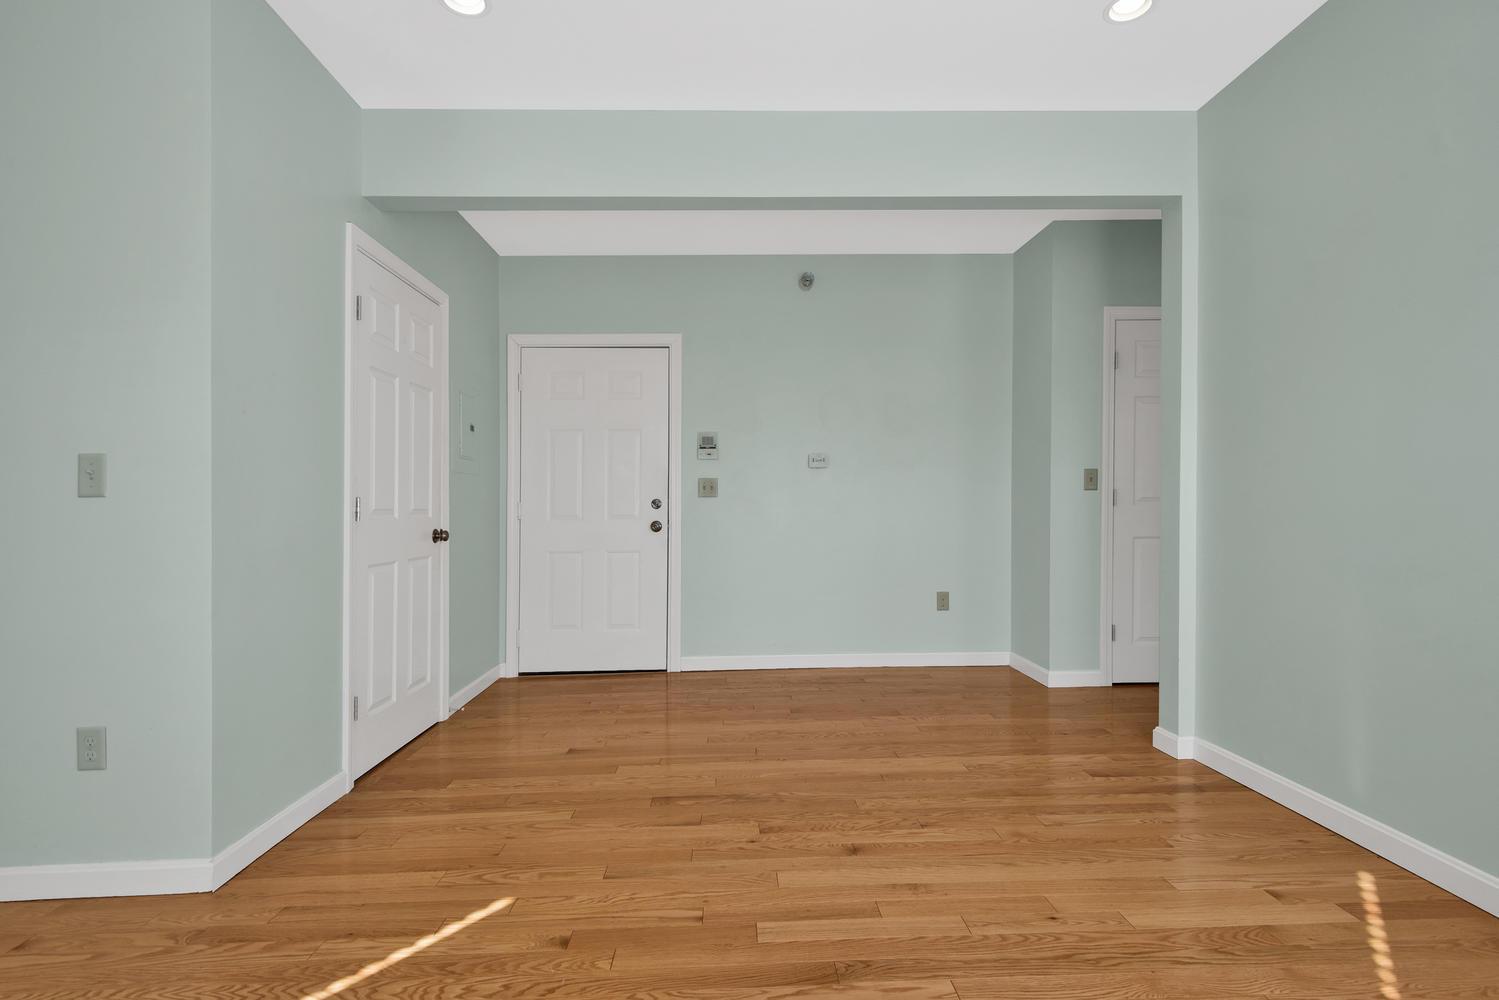 65 Sherman St Unit 12 Portland-large-011-13-Living Room-1499x1000-72dpi.jpg